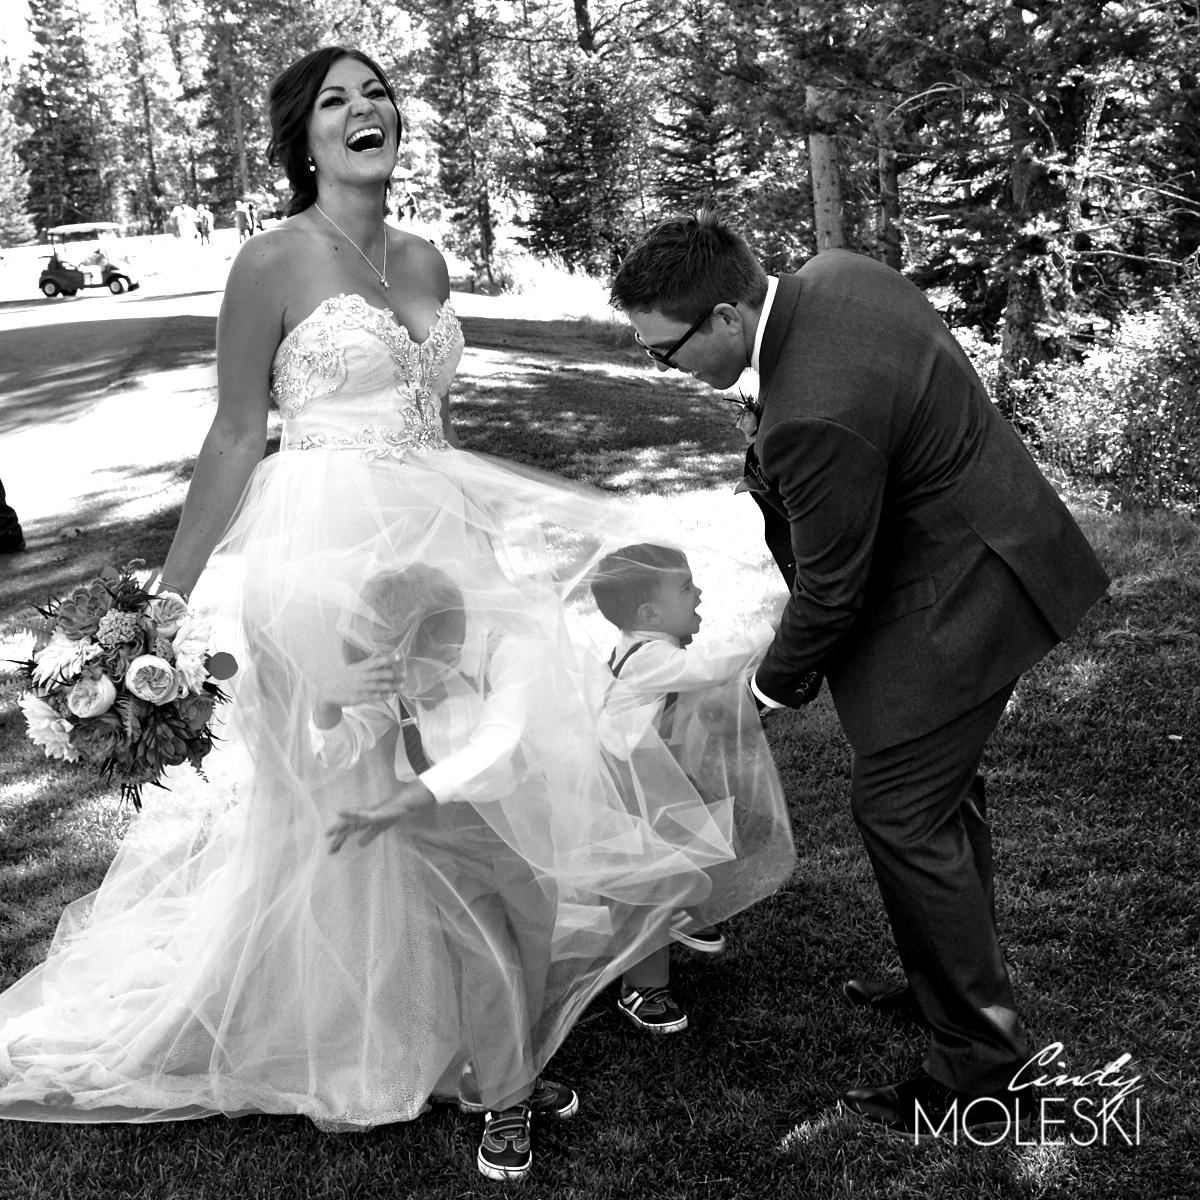 cindy-moleski-professional-wedding-photographer-saskatoon-saskatchewan-canmore-alberta-29037-7525.jpg